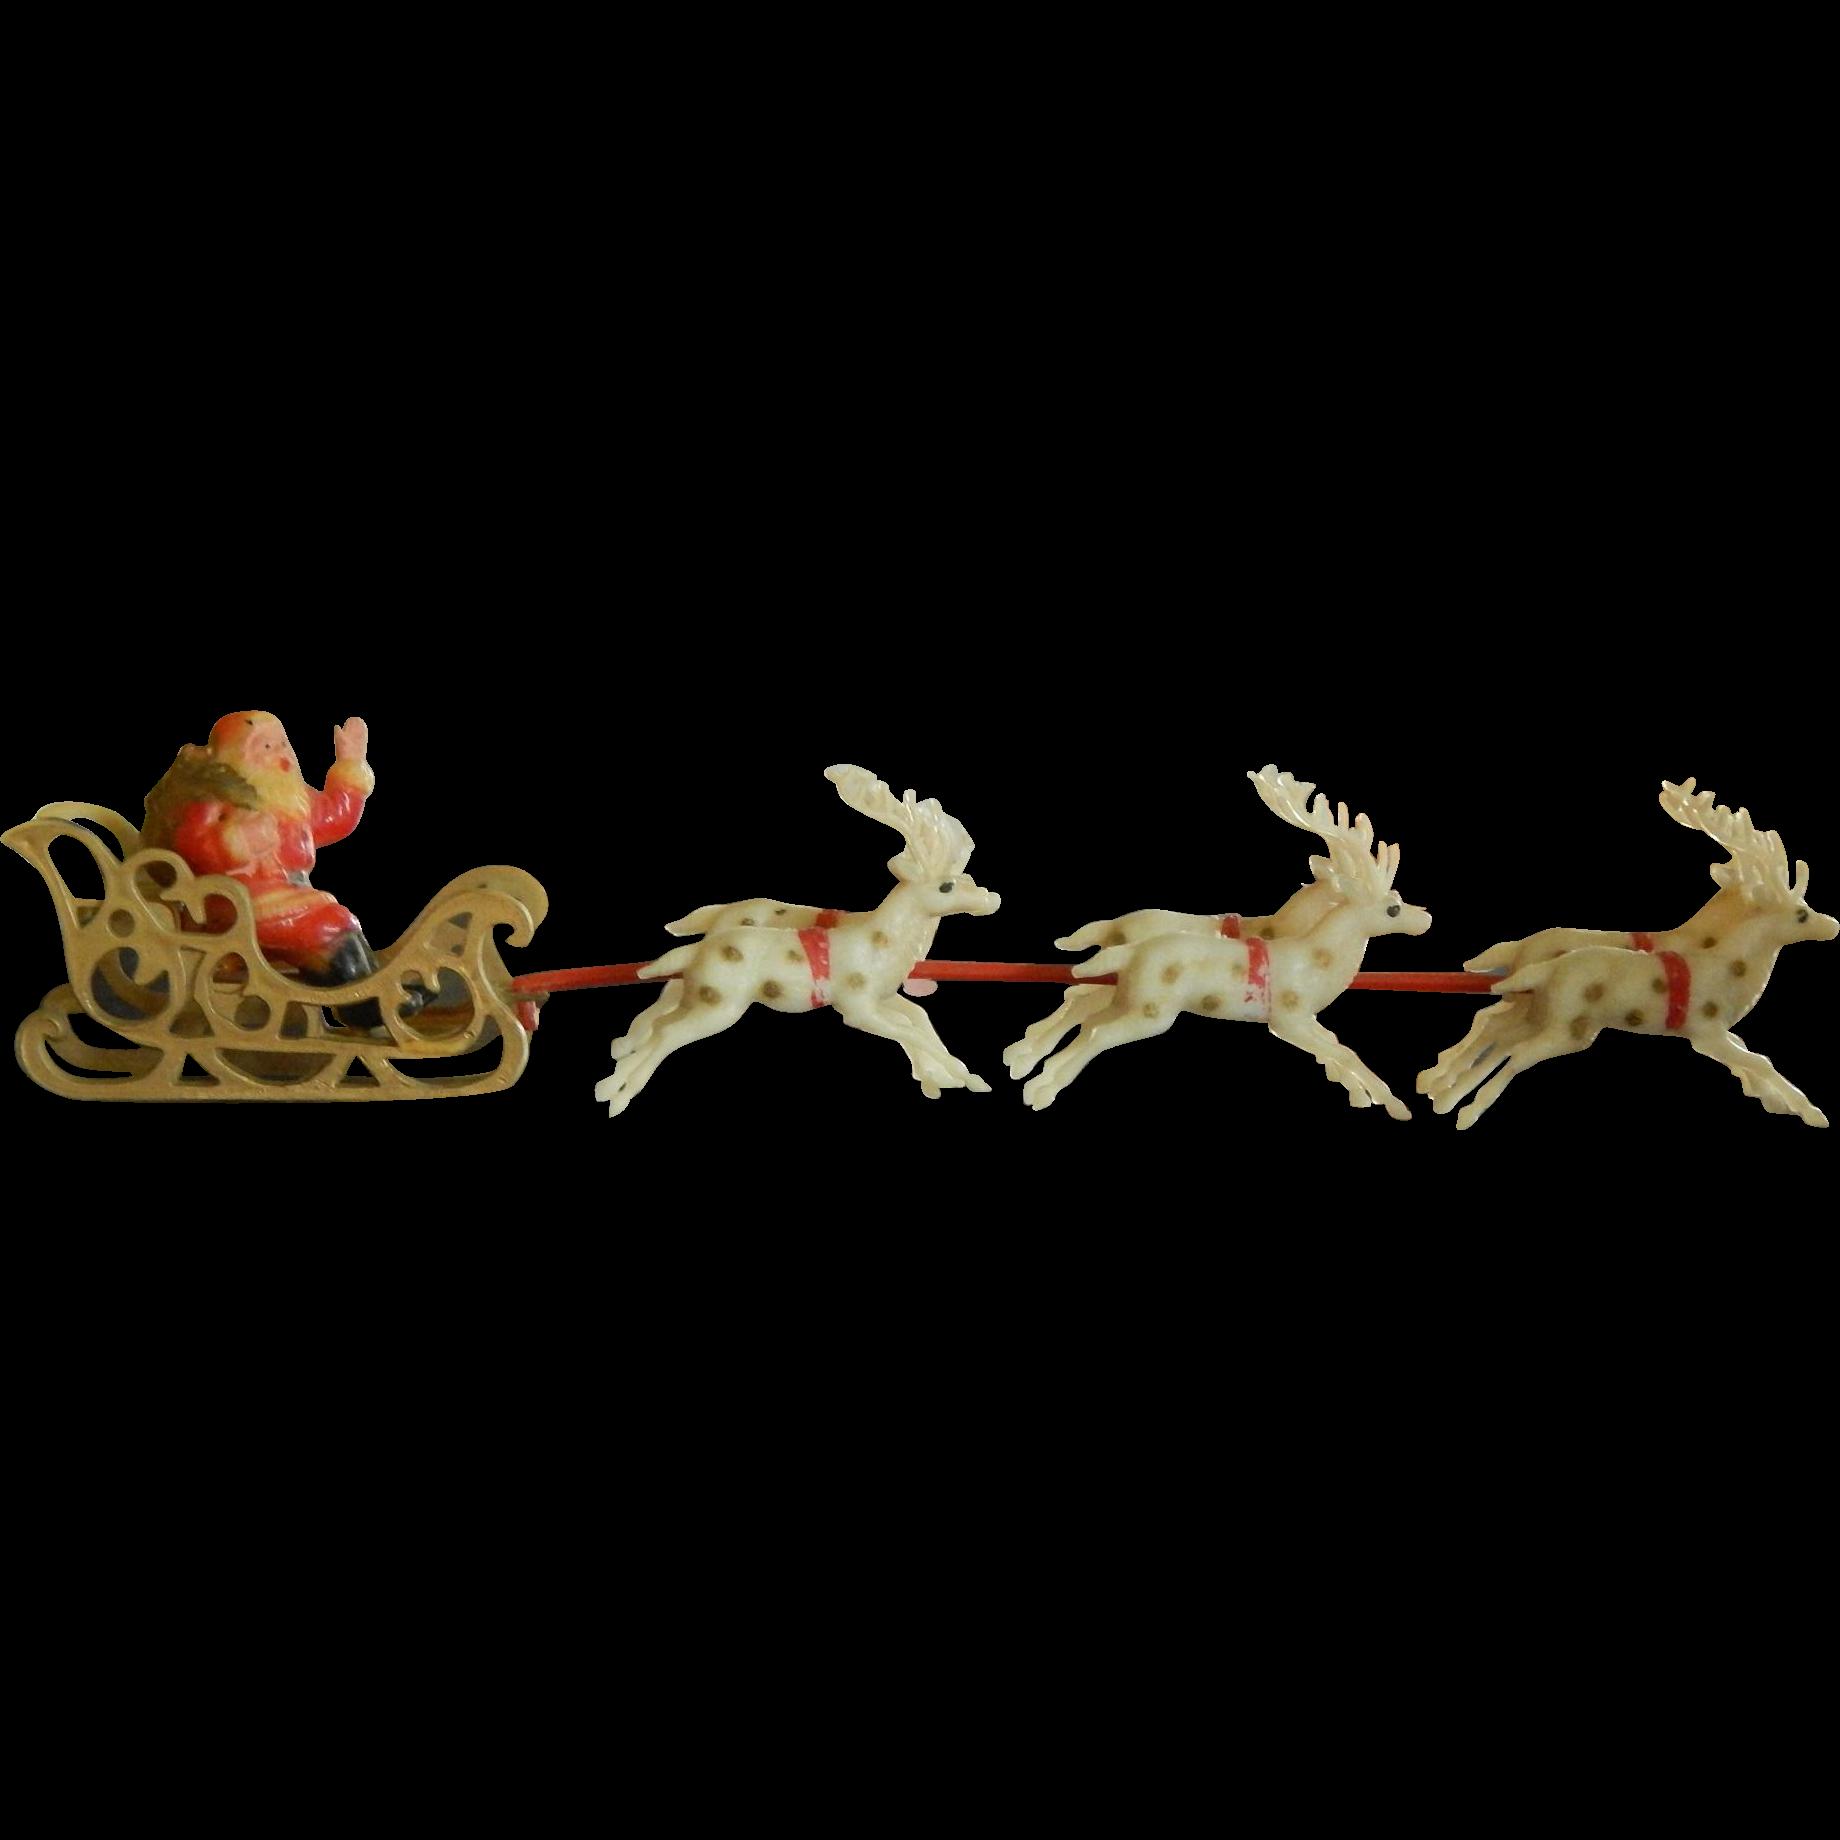 Sleigh clipart christmas sleigh ride. Santas reindeer romeo landinez